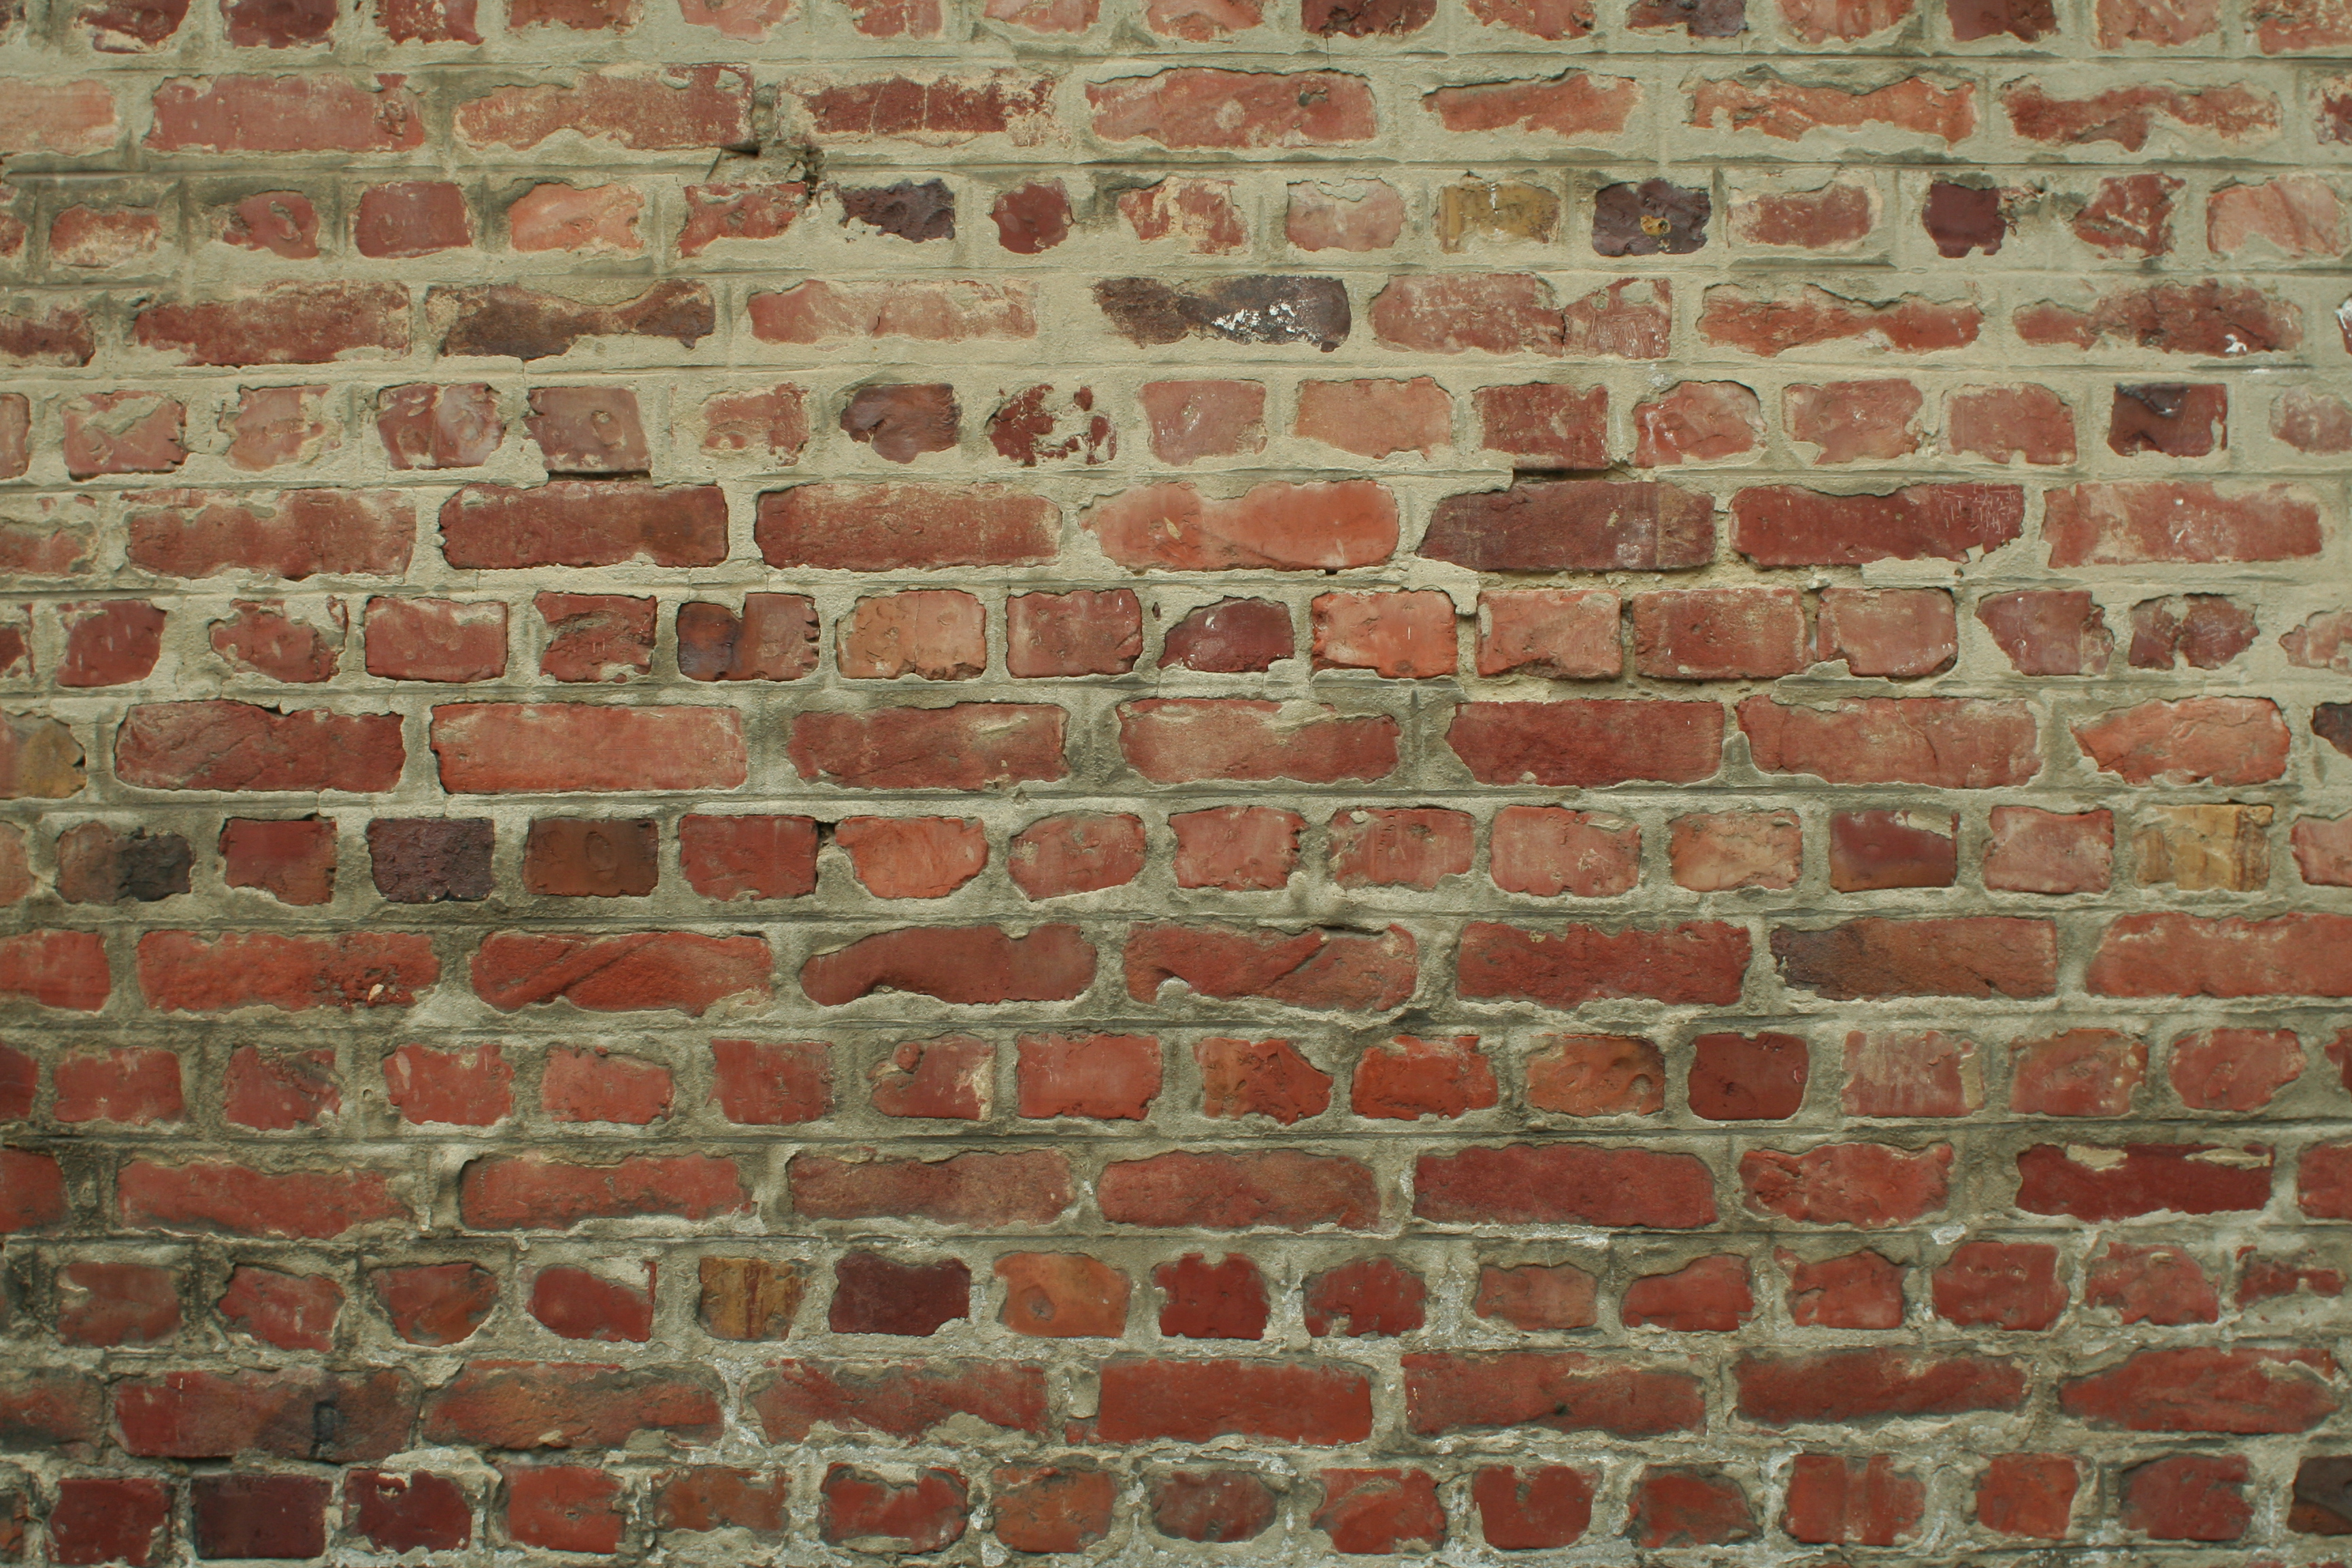 file brick texture saint omer pas de calais 06 jpg wikimedia commons. Black Bedroom Furniture Sets. Home Design Ideas